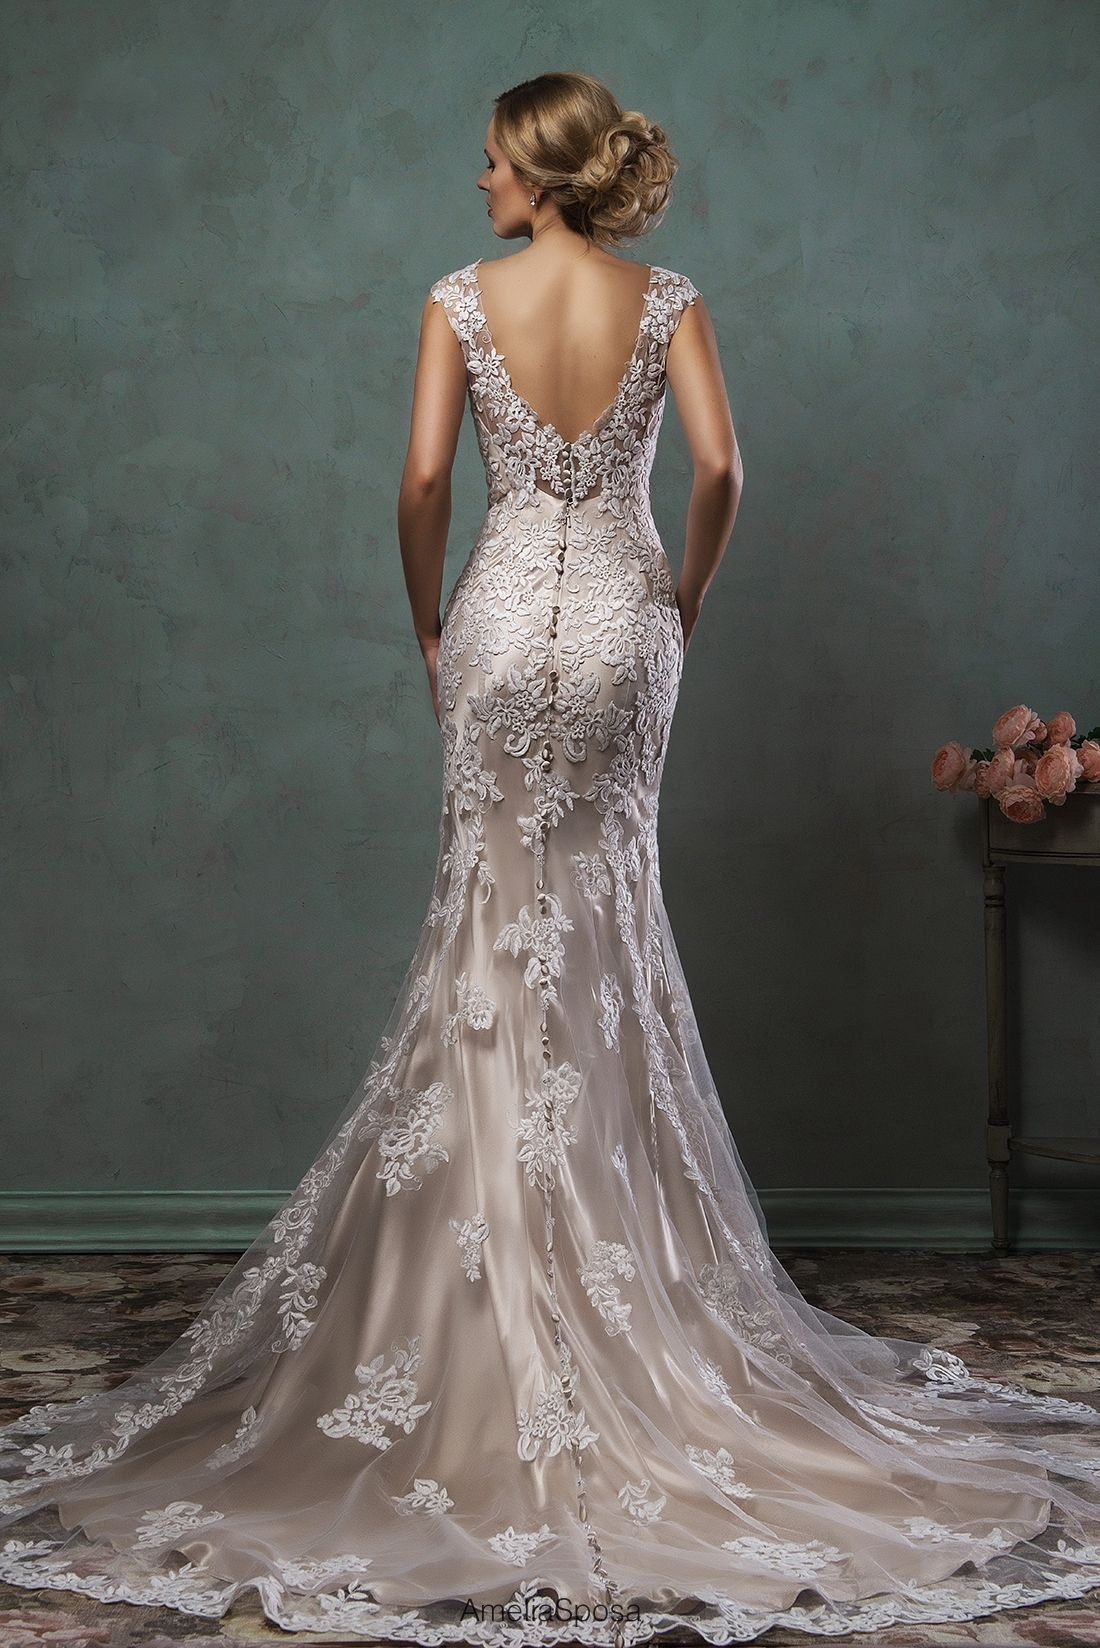 Wedding dress Alba | Amelia Sposa 2016 | AmeliaSposa | Pinterest ...